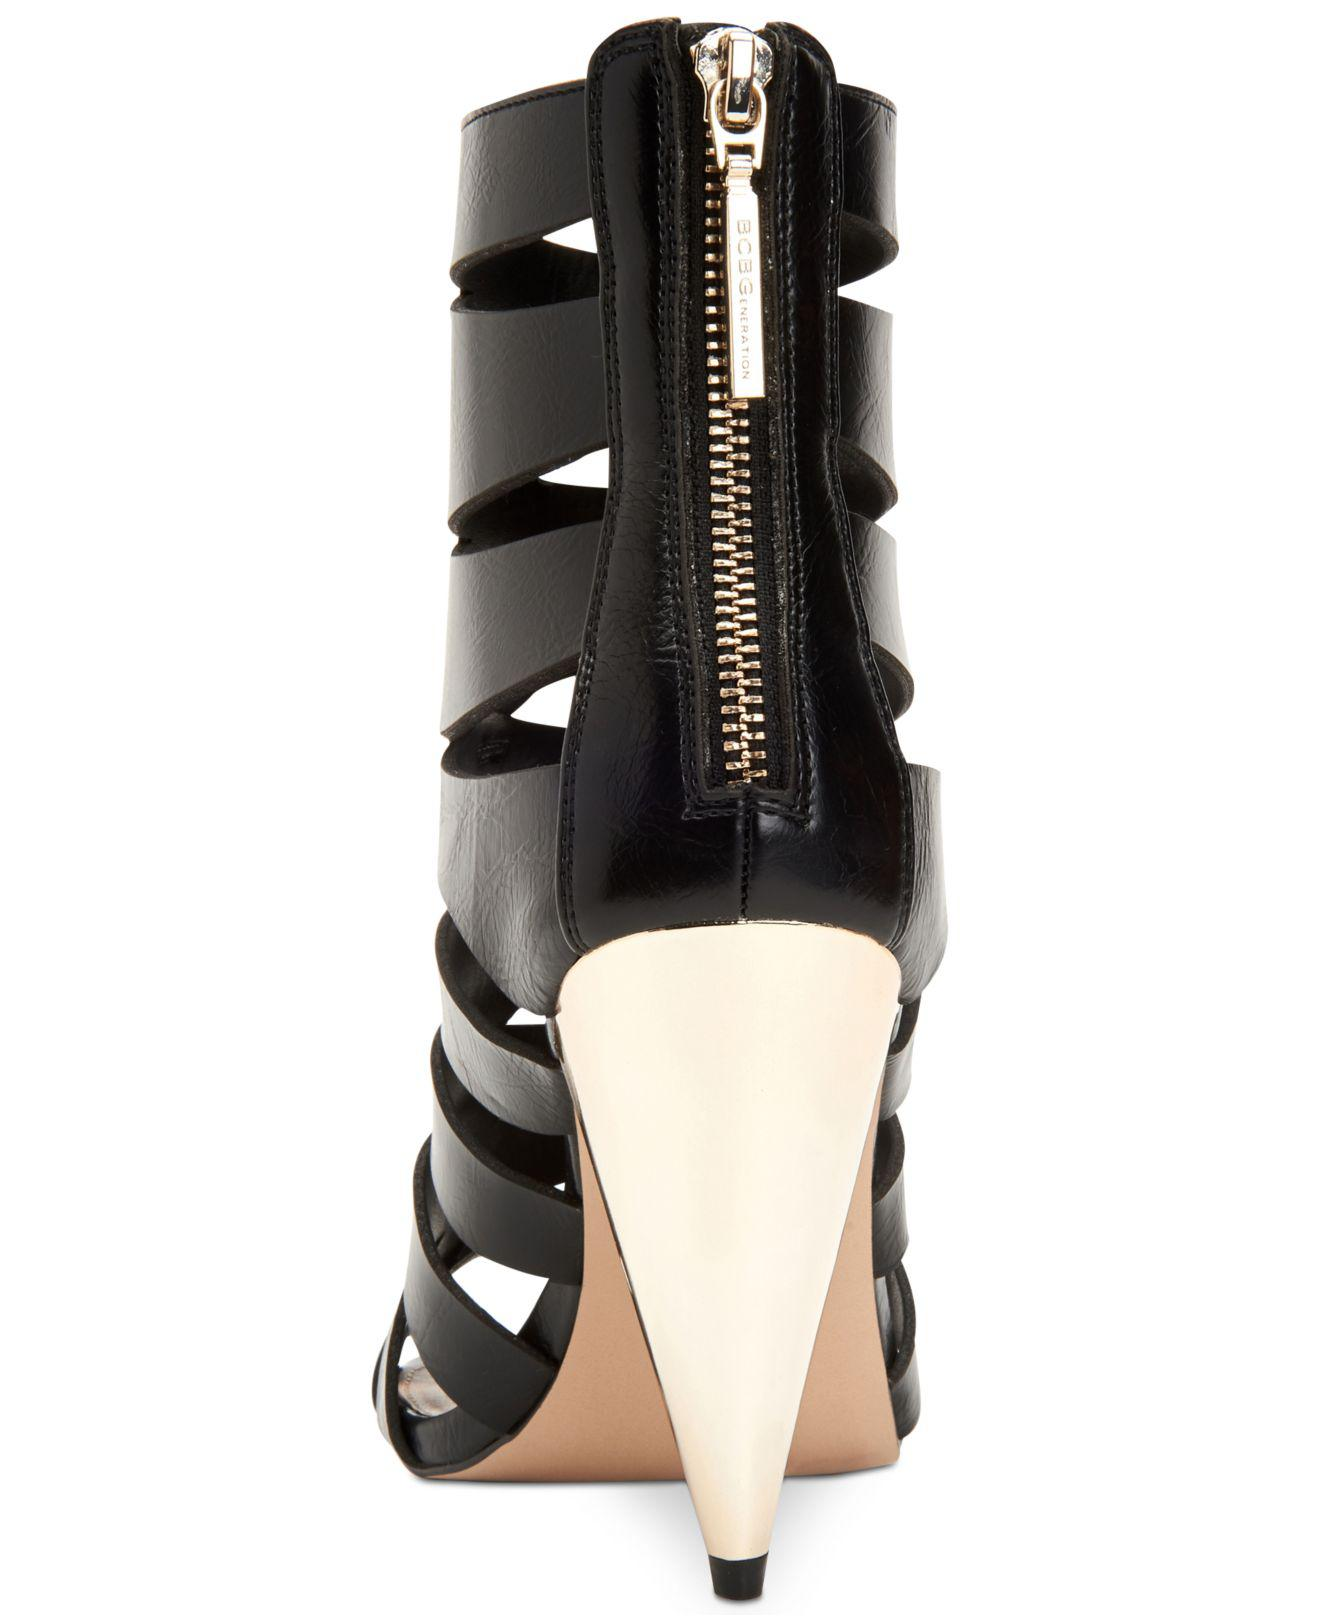 dcb1809add Lyst - BCBGeneration Nadeline Cone-heel Dress Sandals in Black